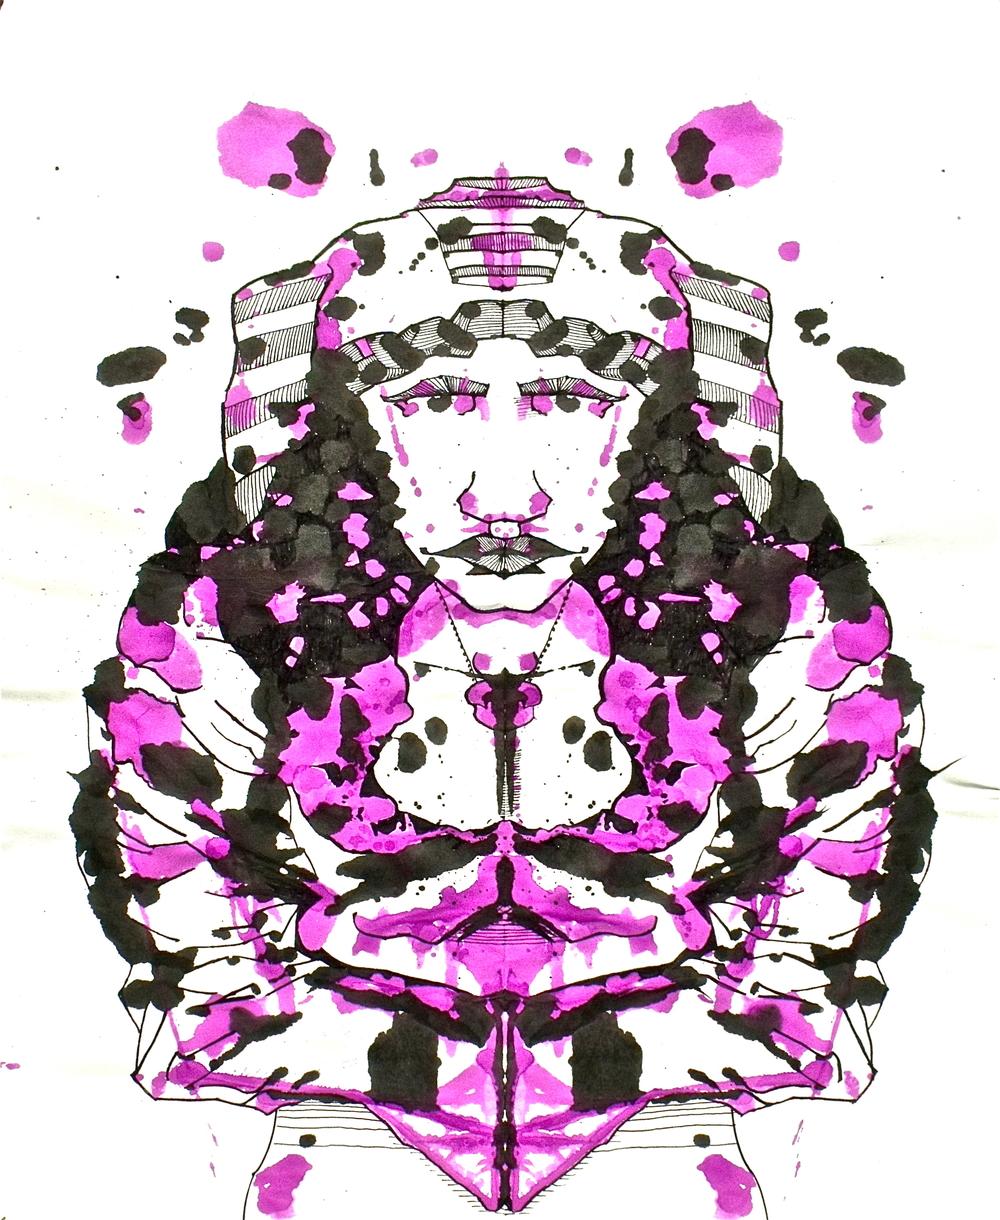 Matrones Inexorbilis